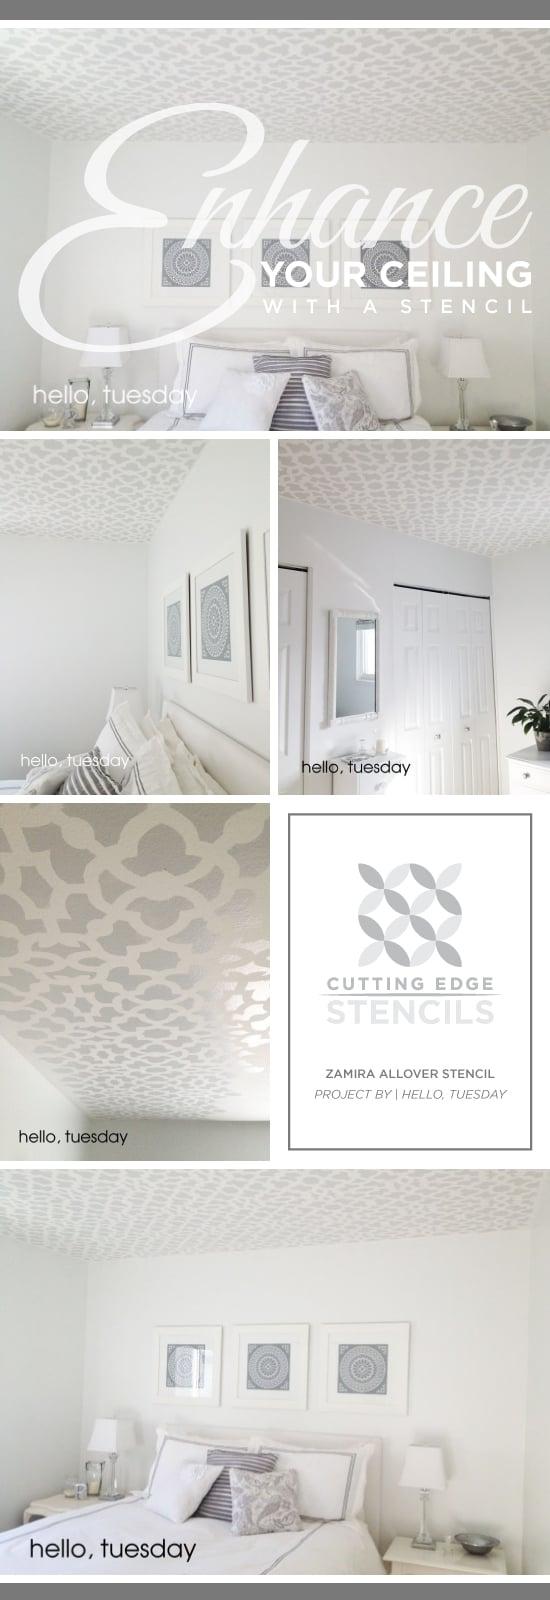 A gray stenciled bedroom ceiling using the Zamira Allover Stencil. http://www.cuttingedgestencils.com/moroccan-stencil-designs.html